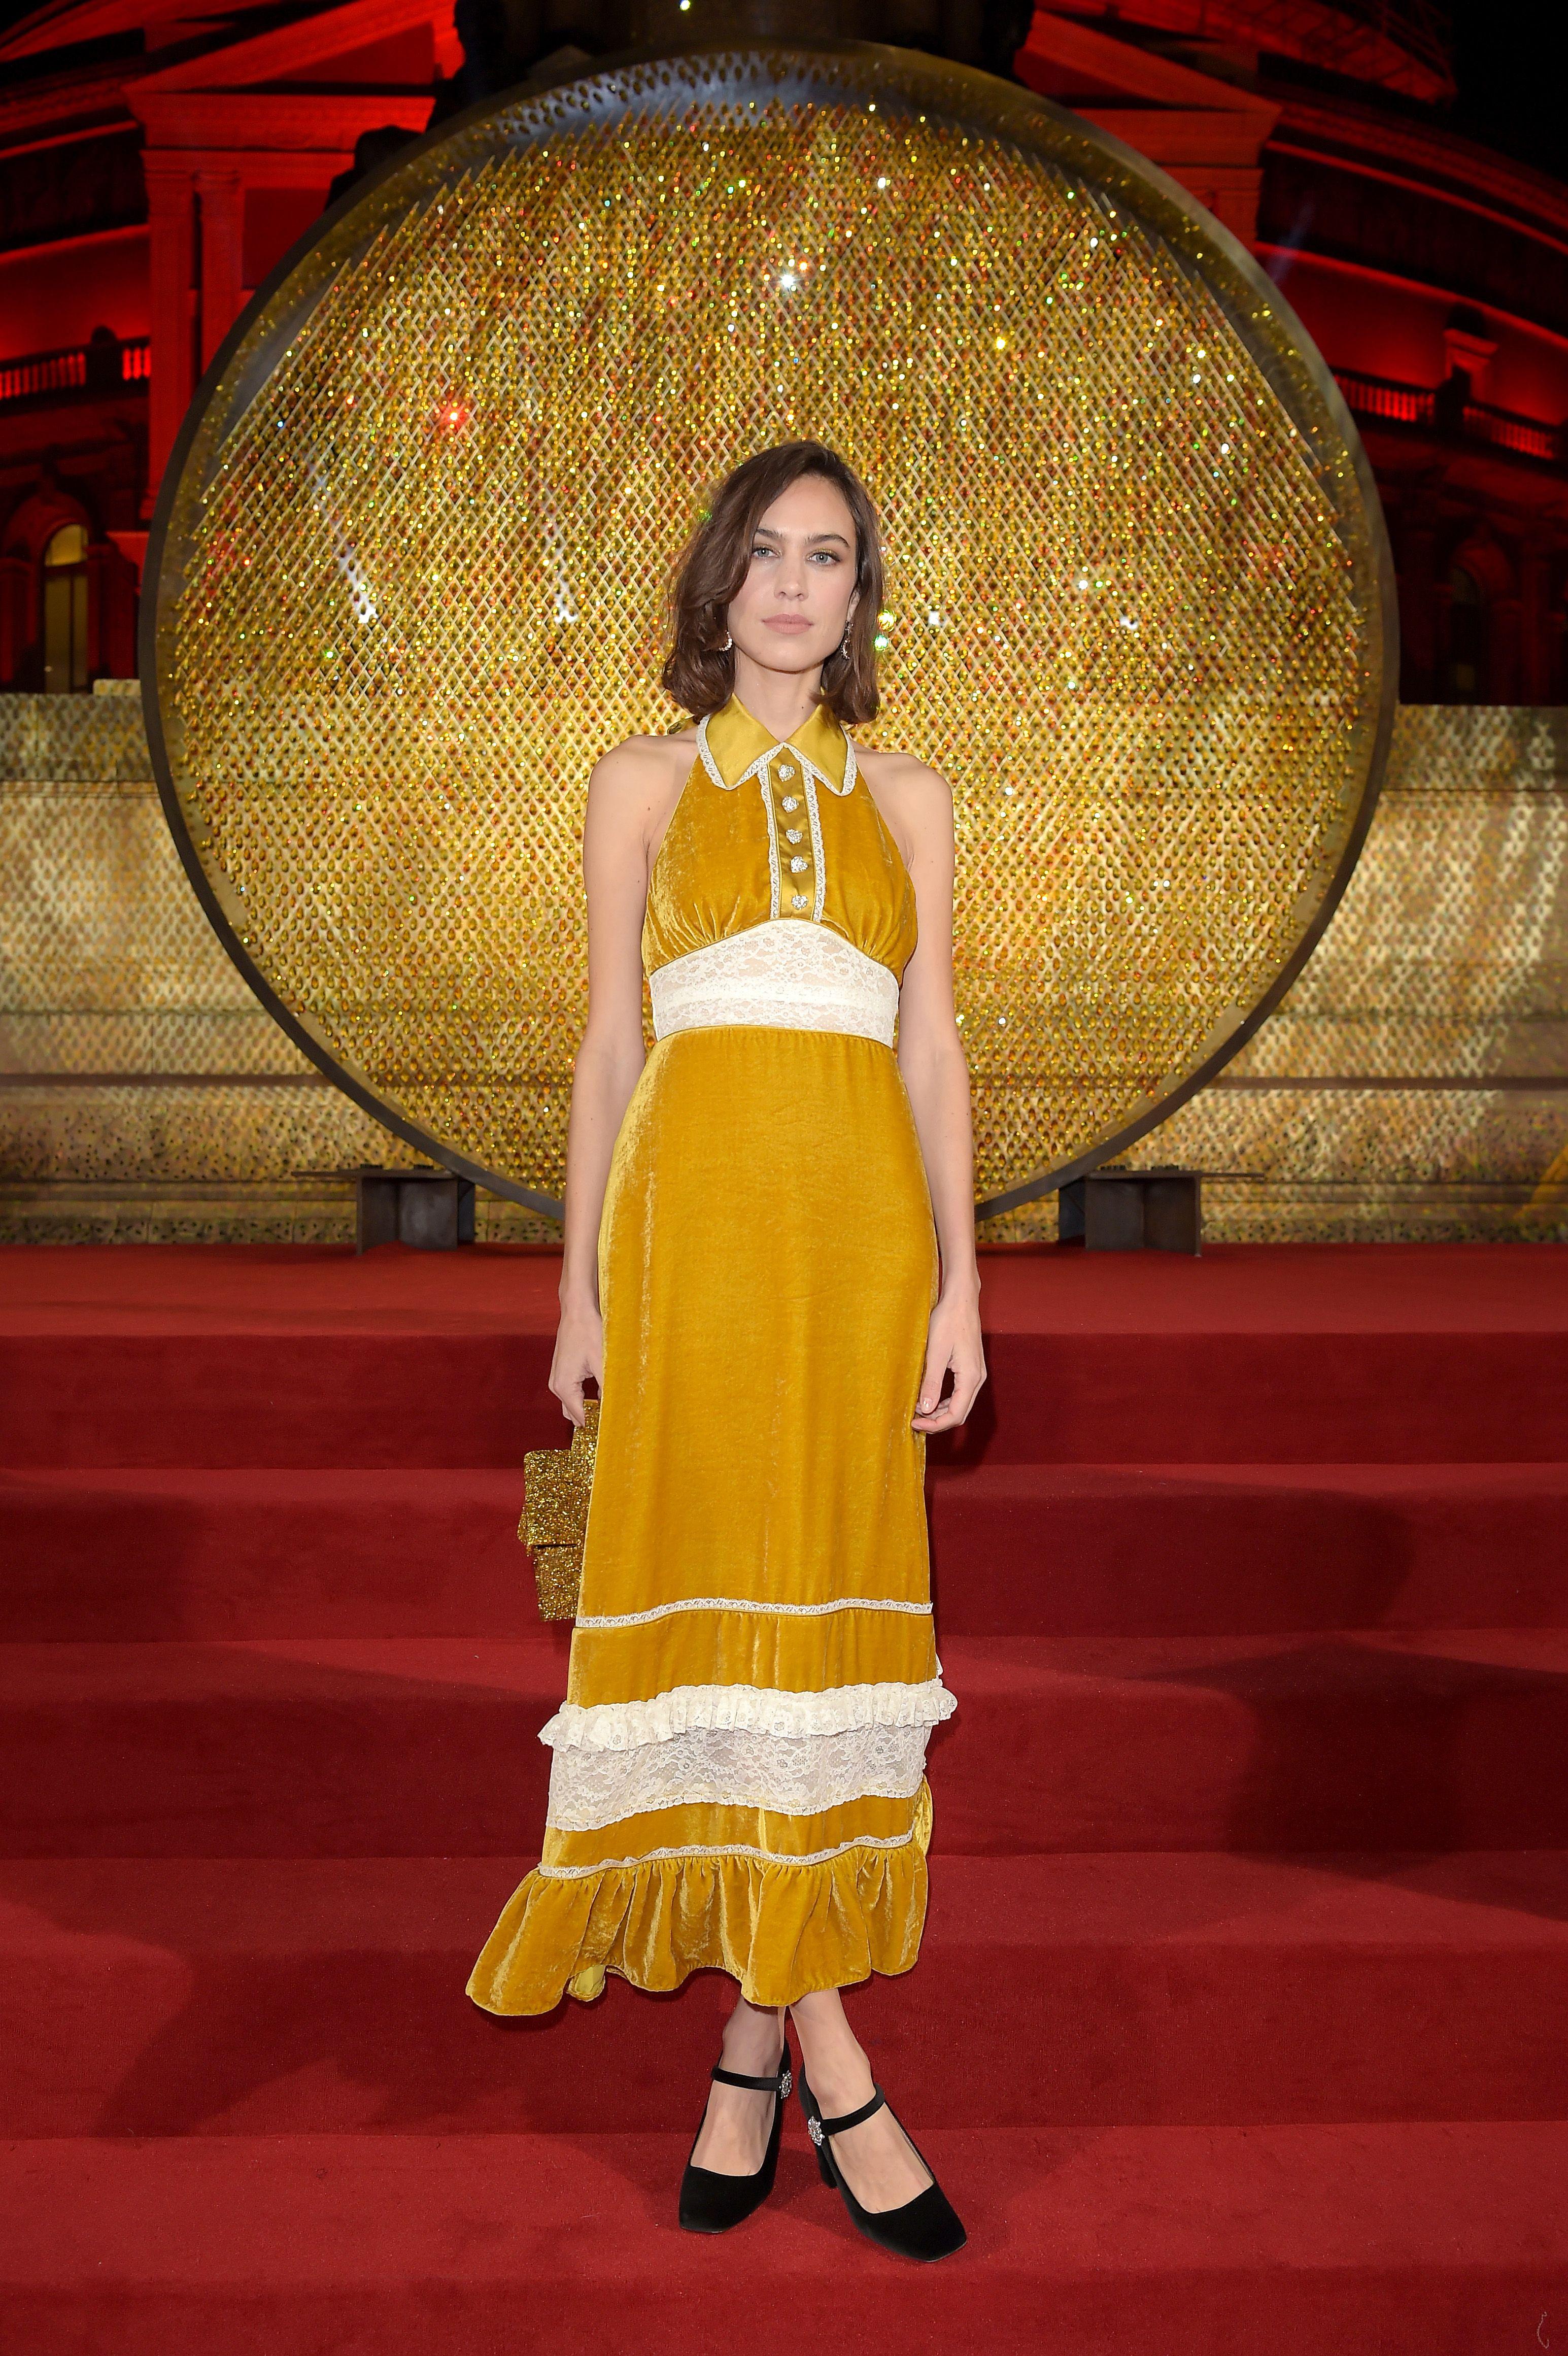 Fashion Awards 2018 Best Dressed Red Carpet Celebrities